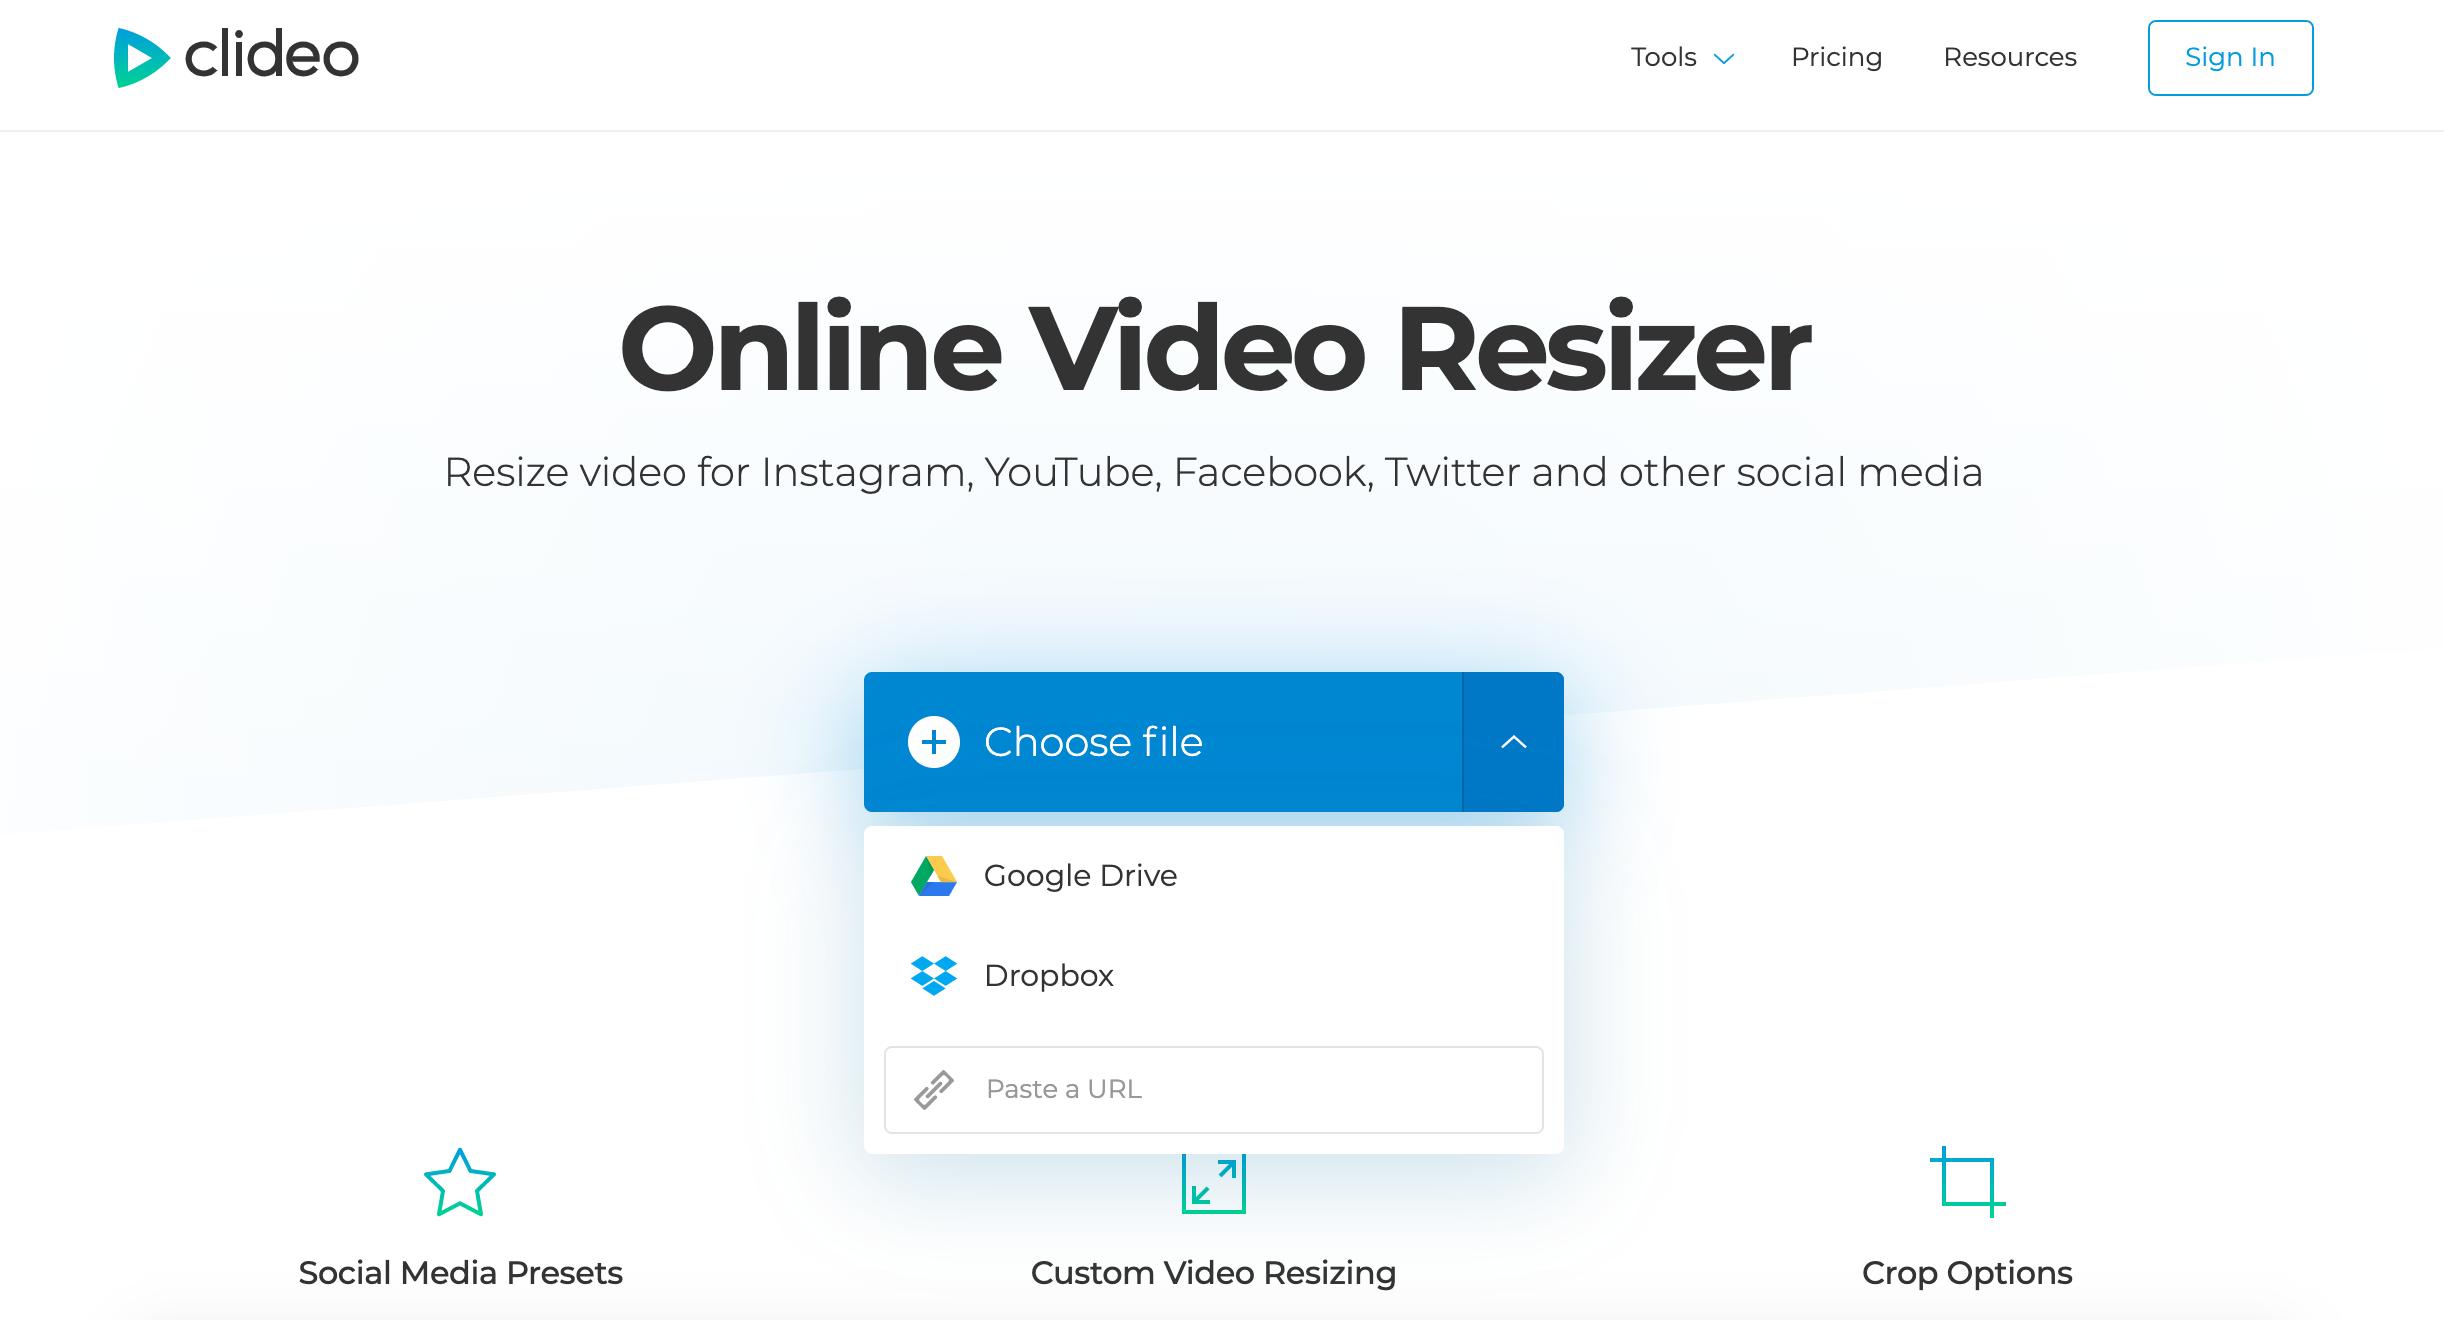 Upload Vimeo video to add to Instagram